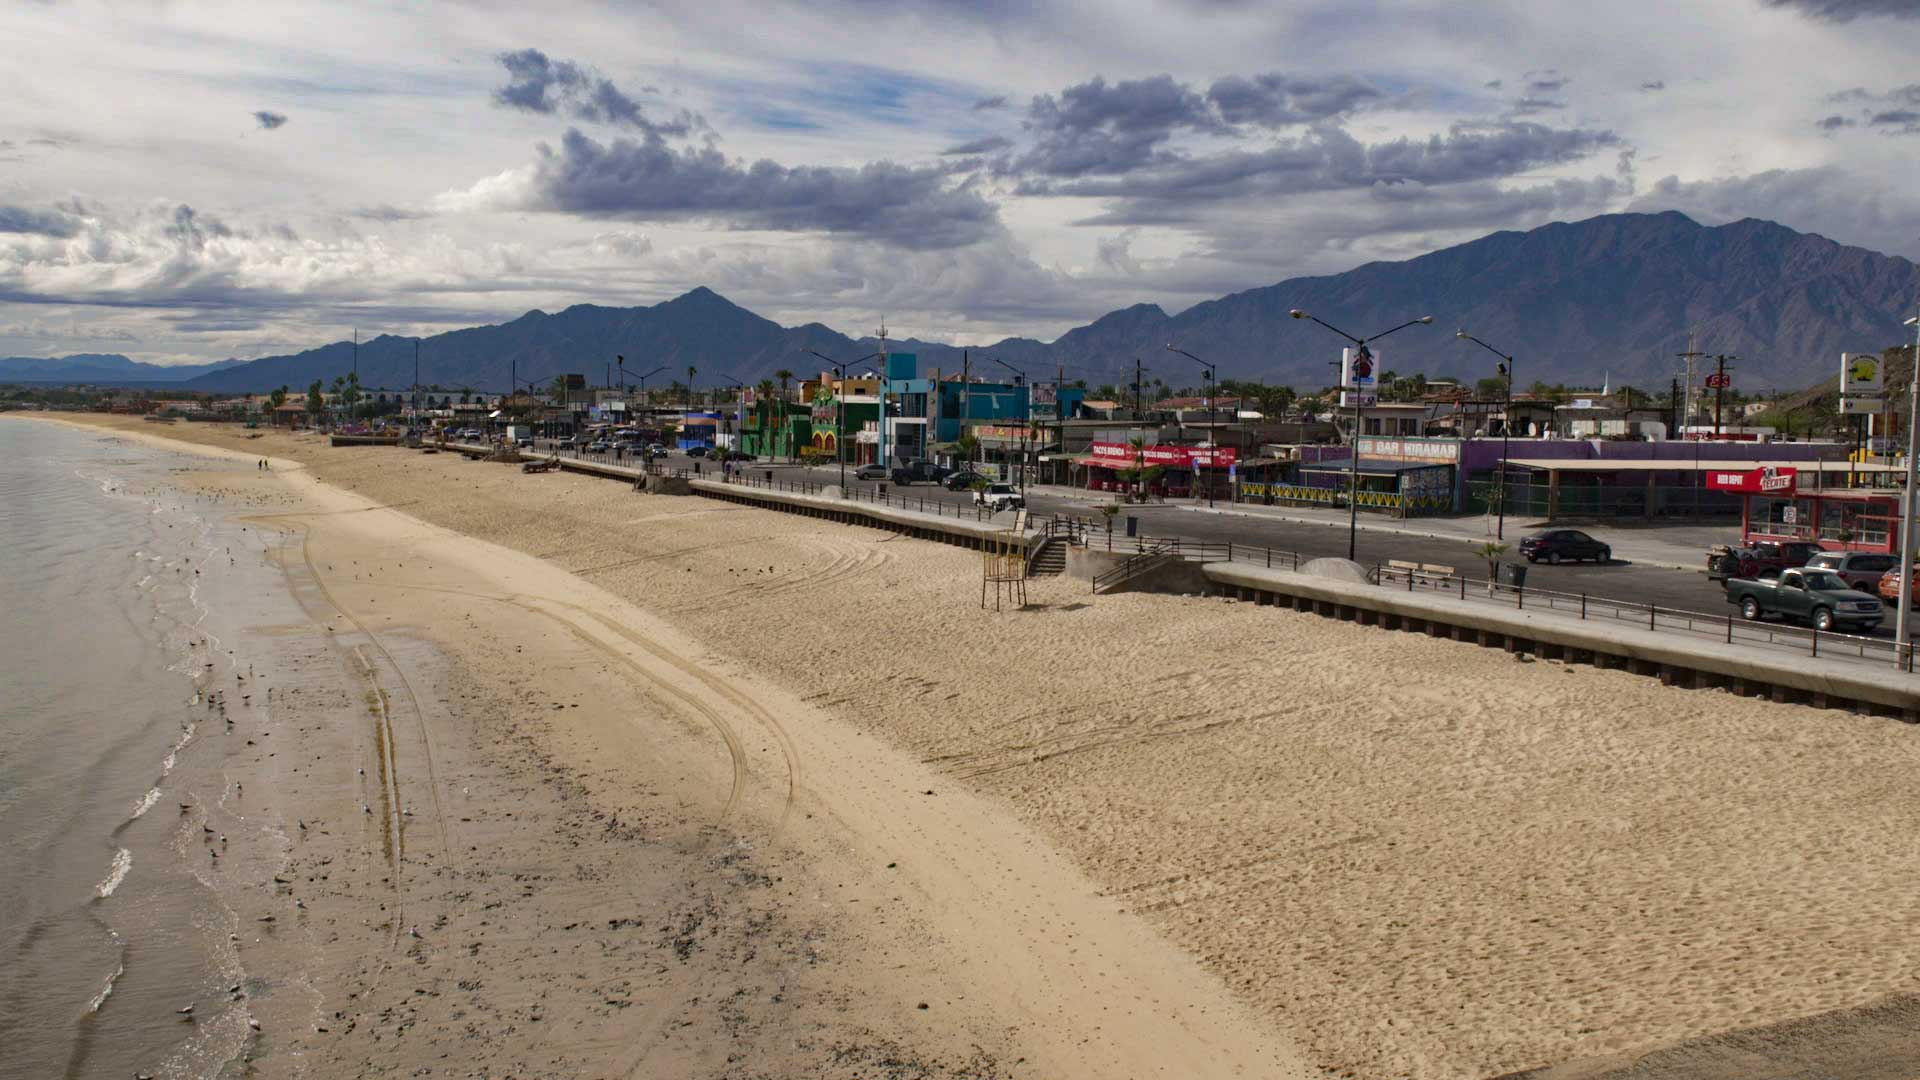 Fishing is a part of the identity of San Felipe, in Baja California.